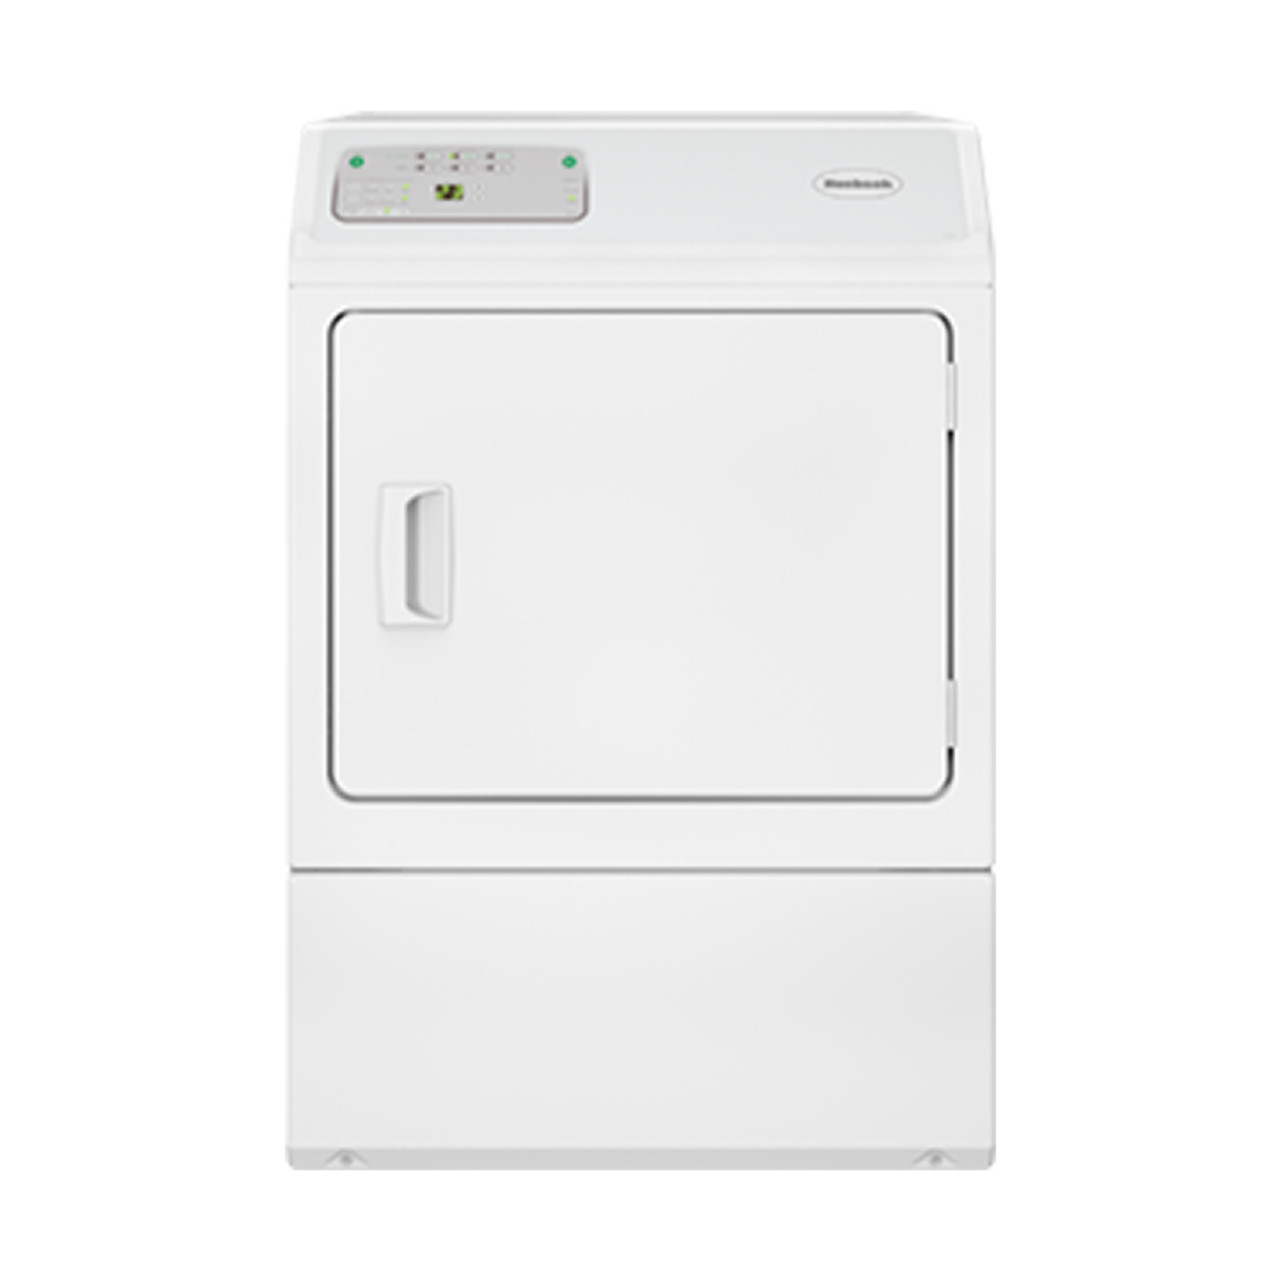 Huebsch Light Commercial OPL Single Load Dryers